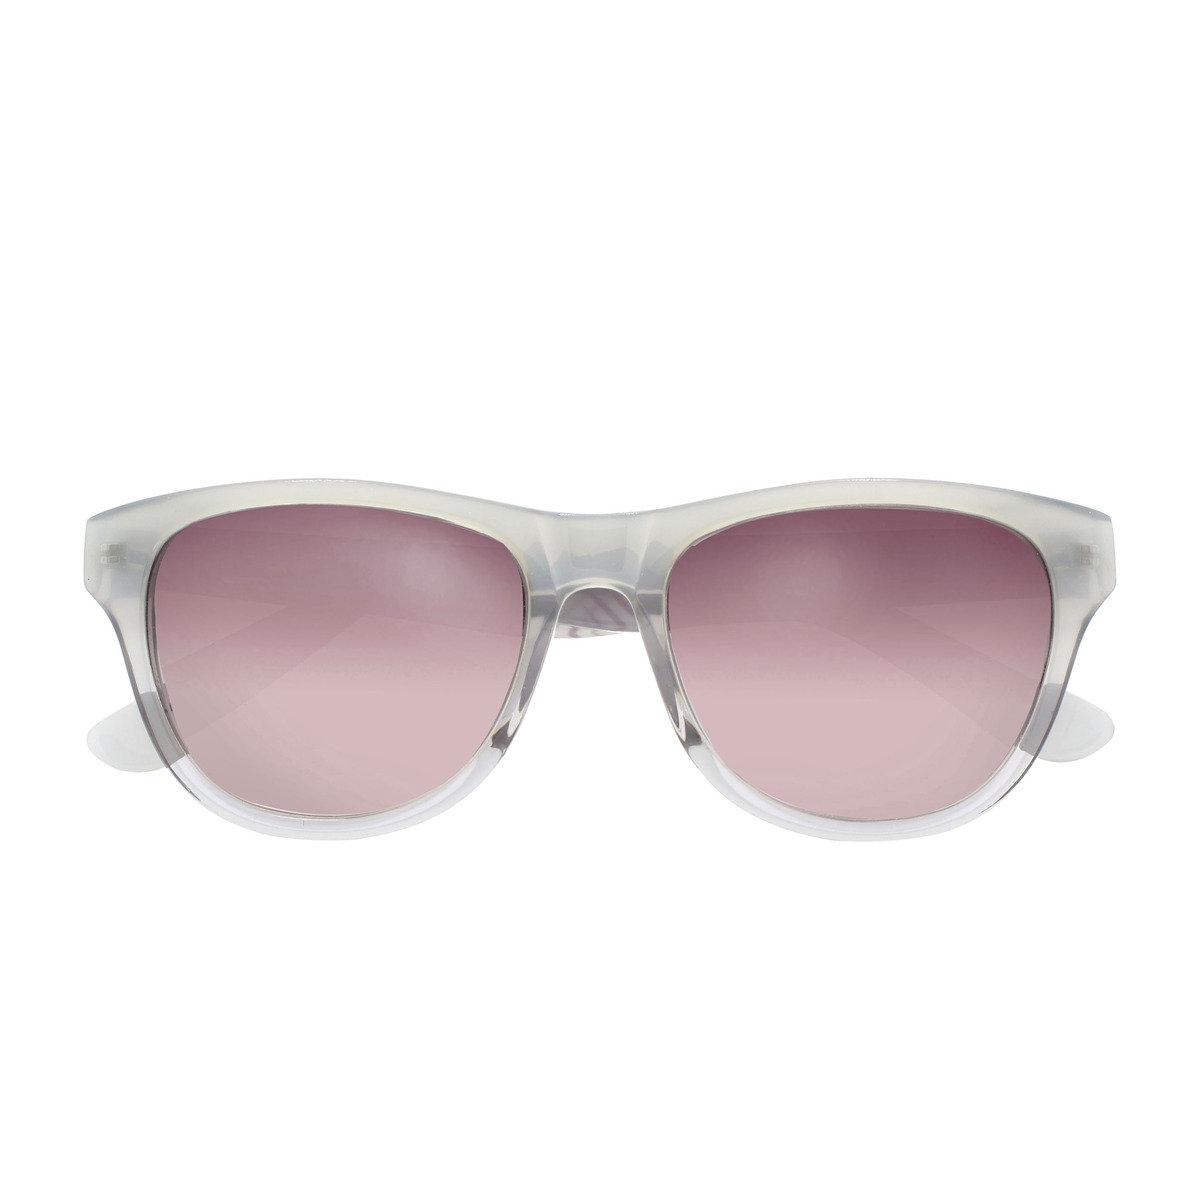 eGG時尚方框防UV淺灰太陽眼鏡